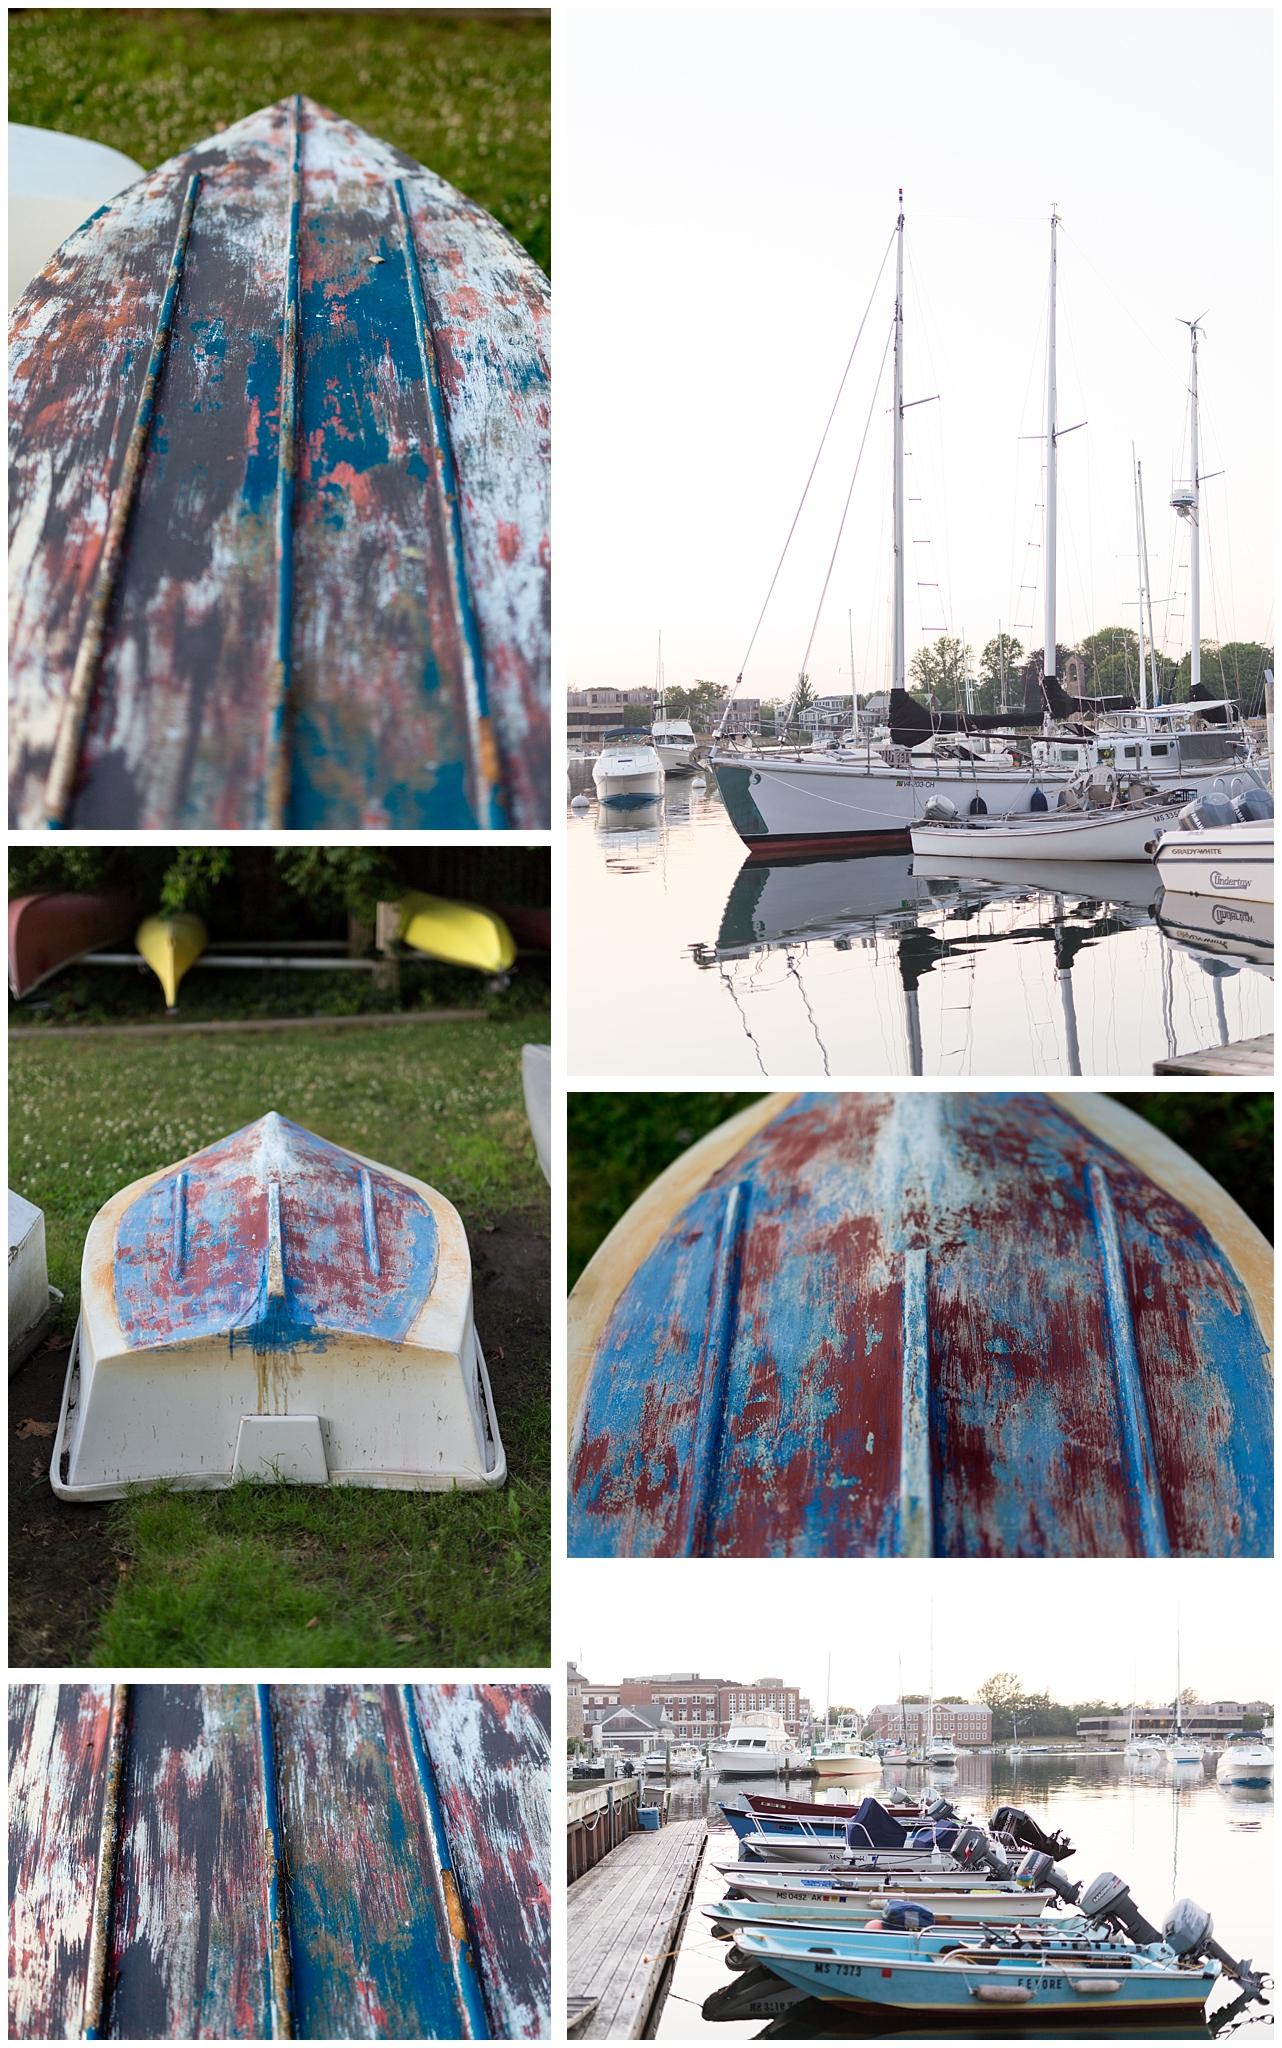 sailboats and peeling pain on rowboat